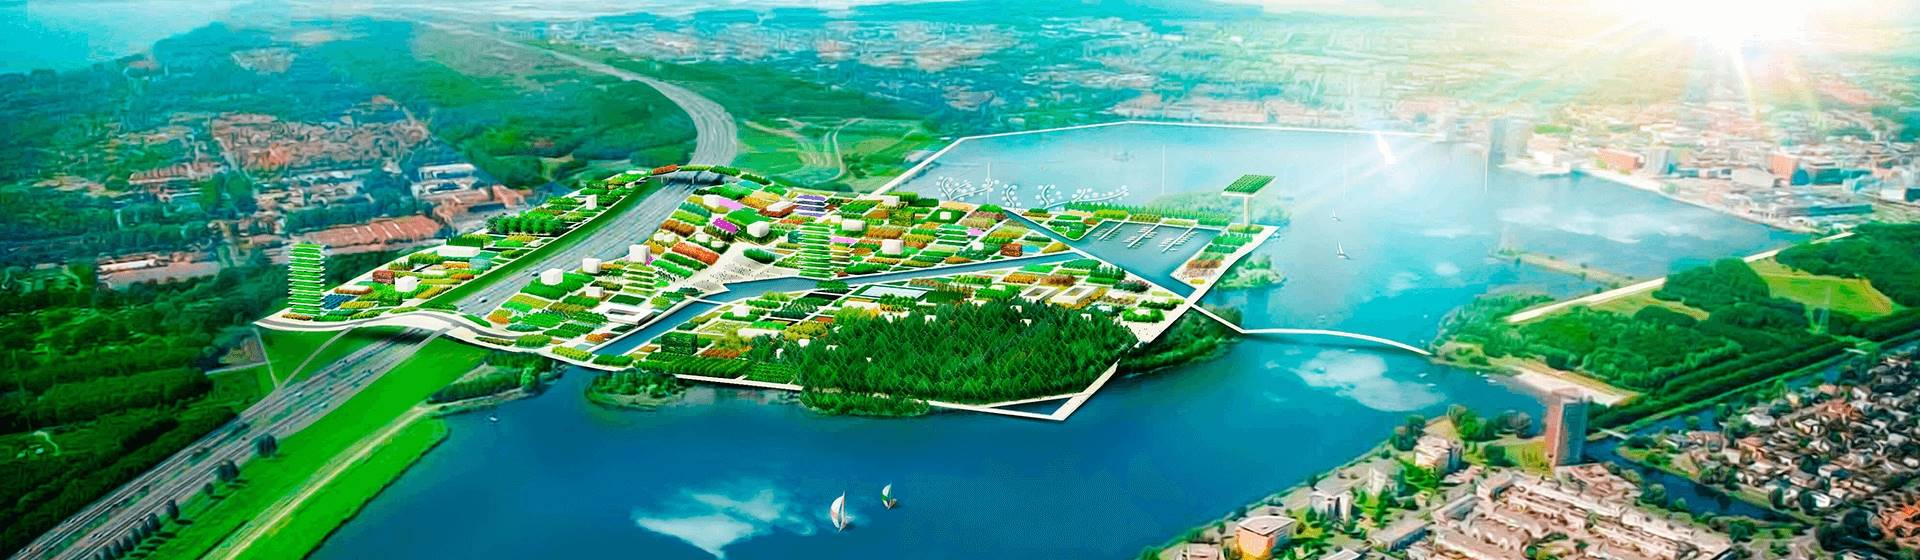 Floriade & Dutch Delights 2022